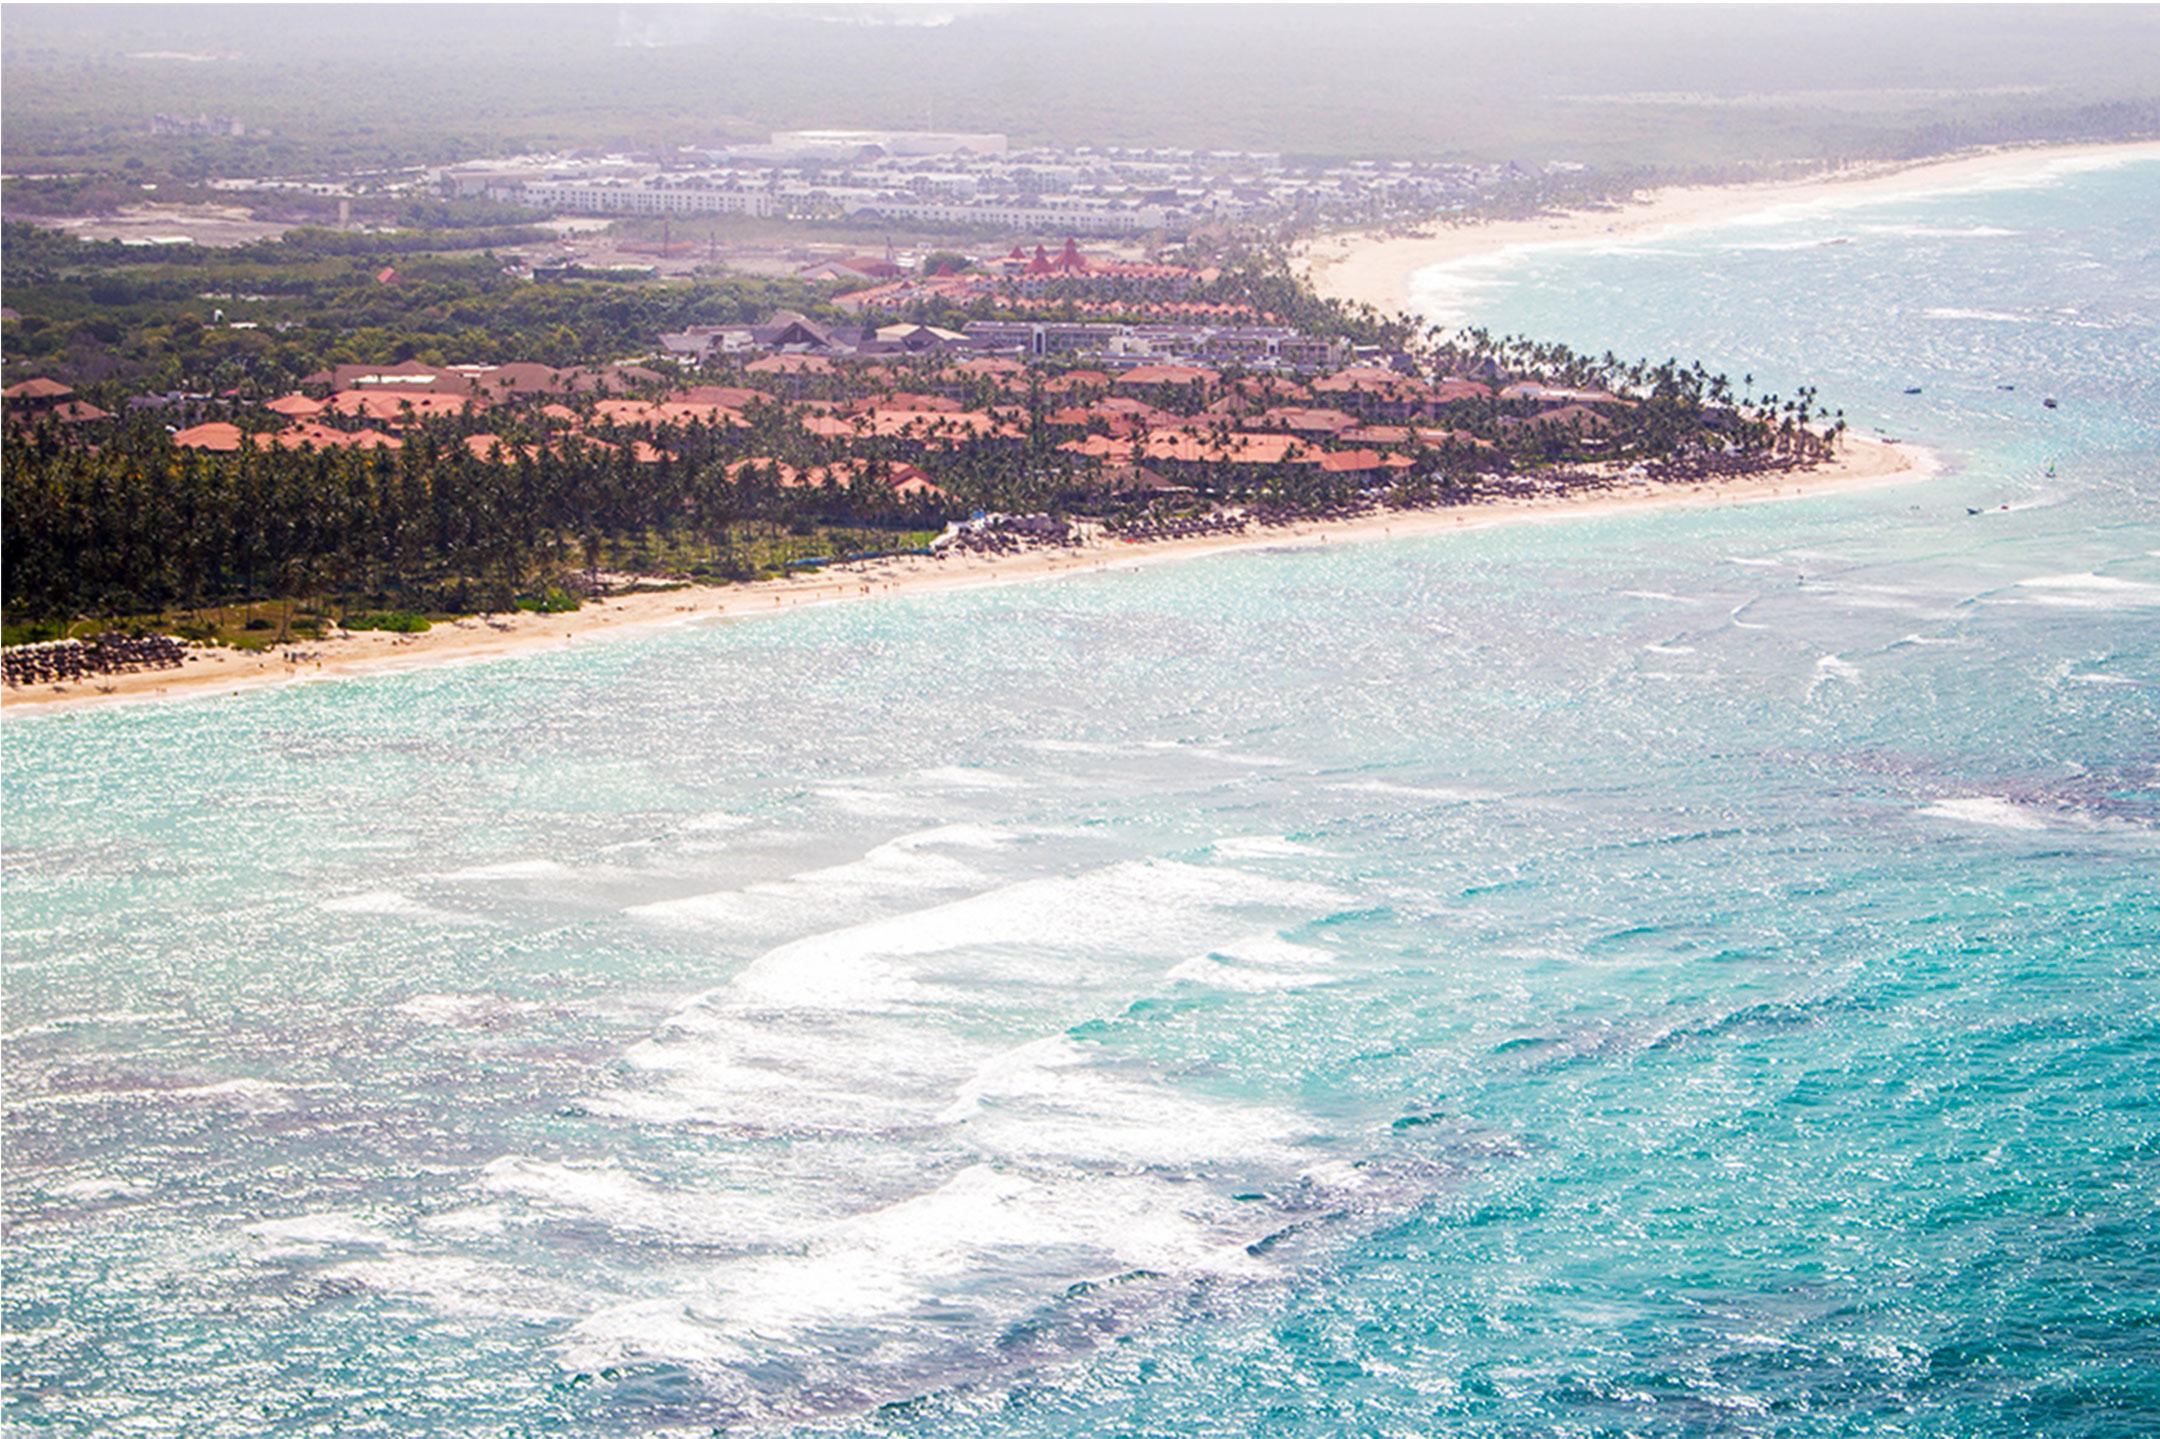 tur v dominikanu punta kana 80 188 rub chel - Тур в Доминикану Пунта Кана 80 188 руб. чел.